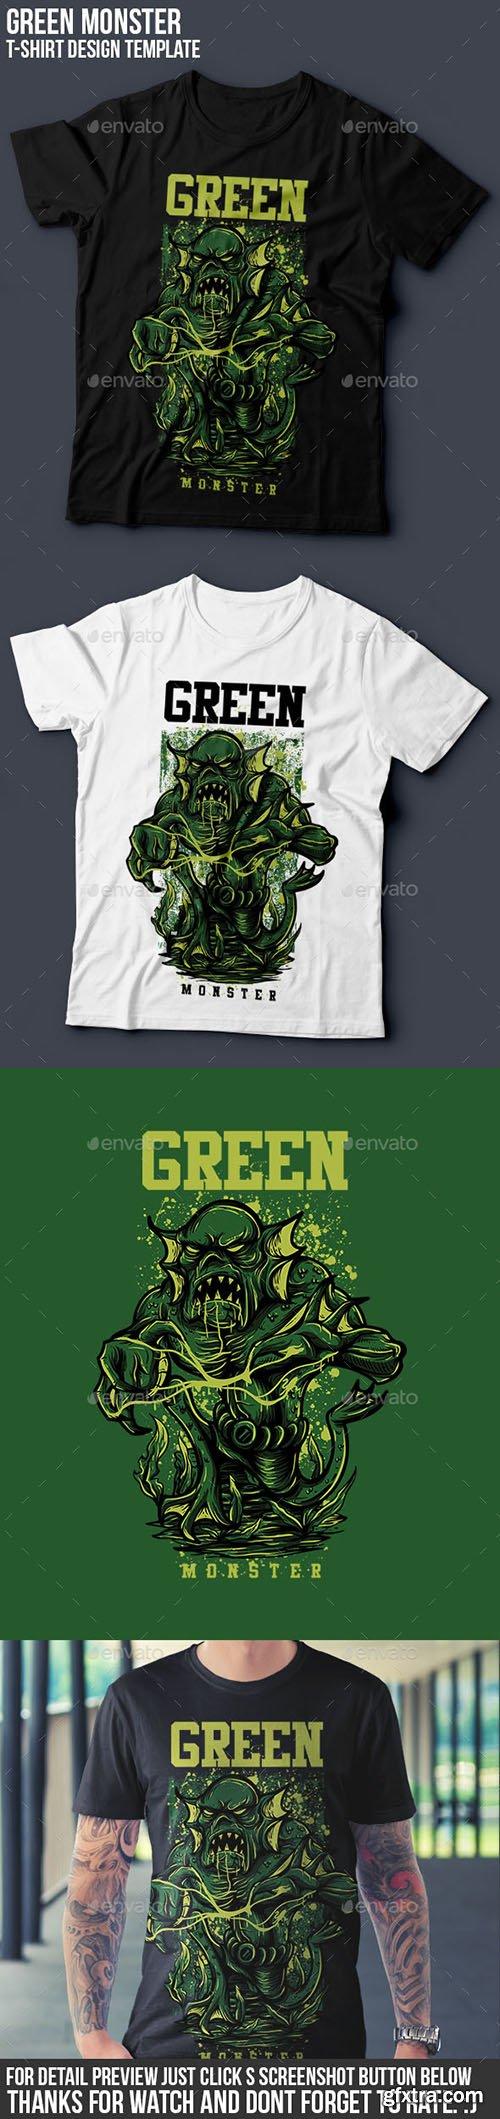 GraphicRiver - Green Monster T-Shirt Design 14496421